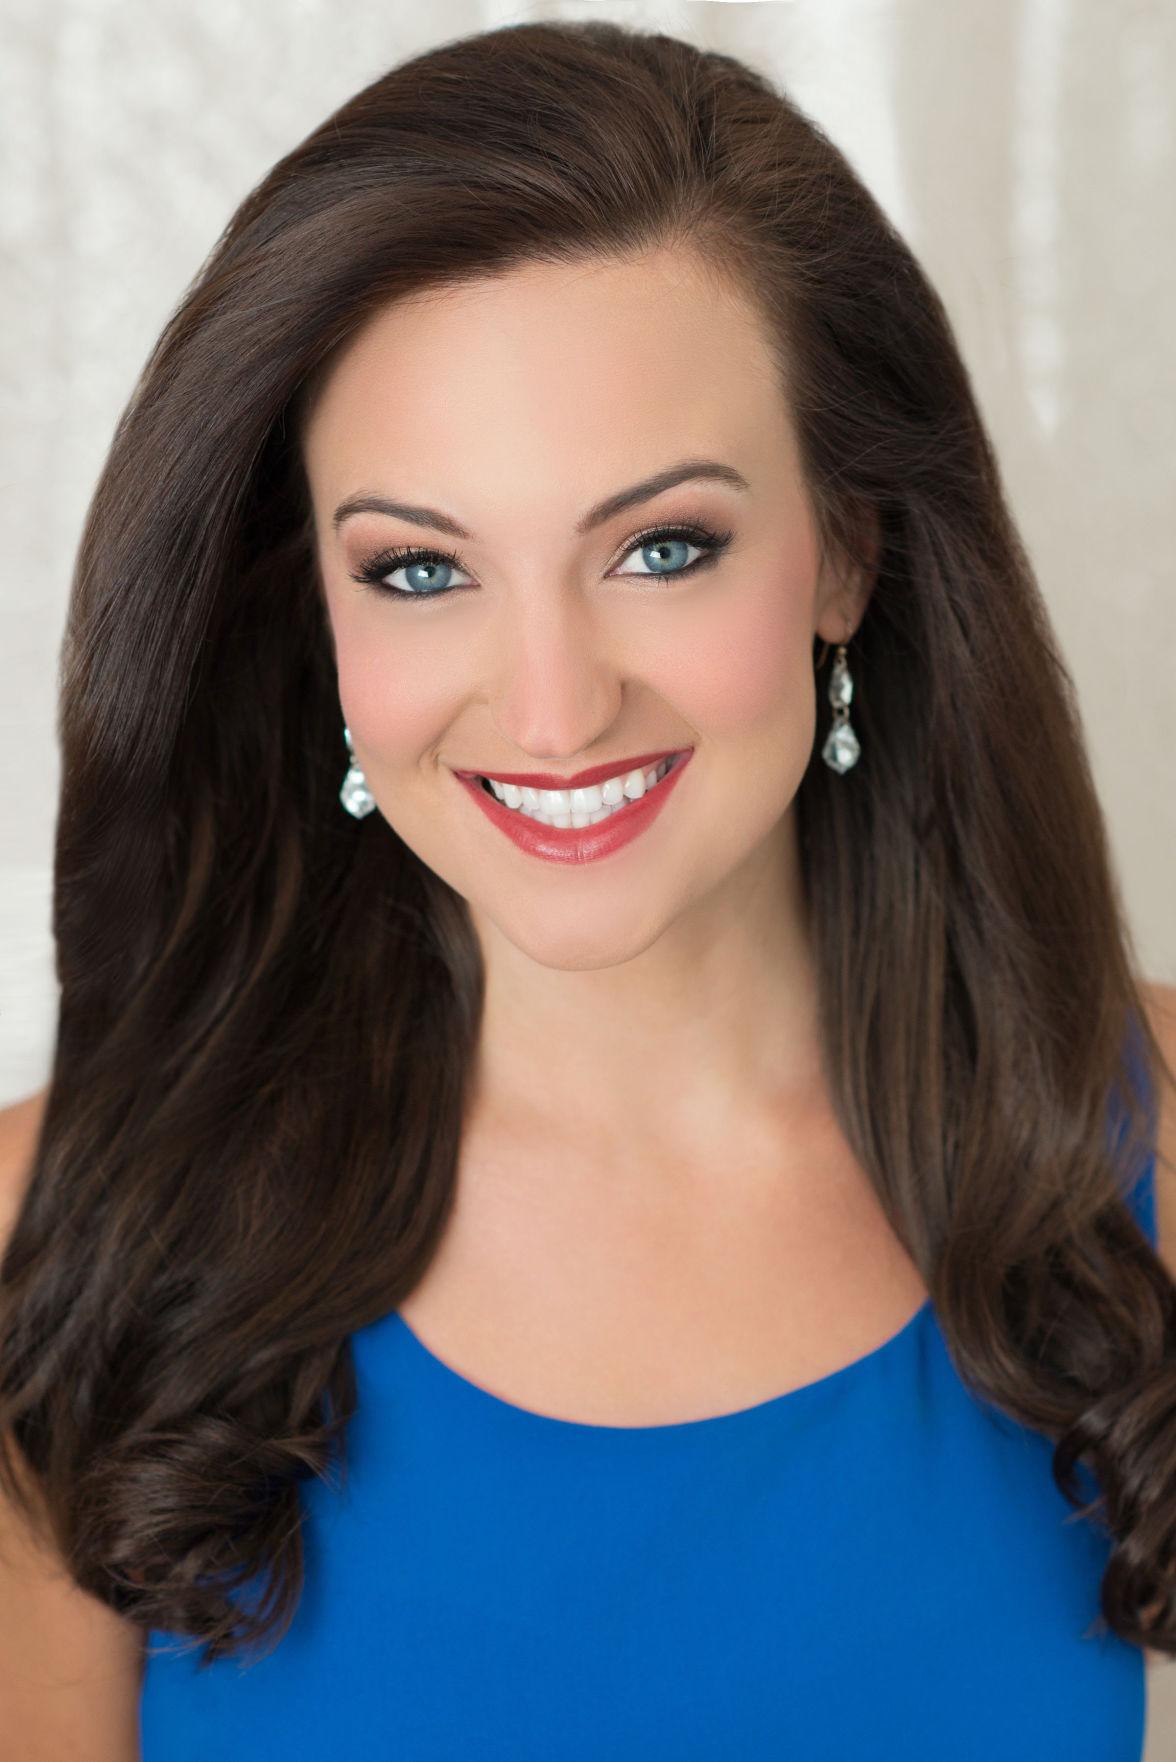 Miss Massachusetts 2017 Jillian Zucco